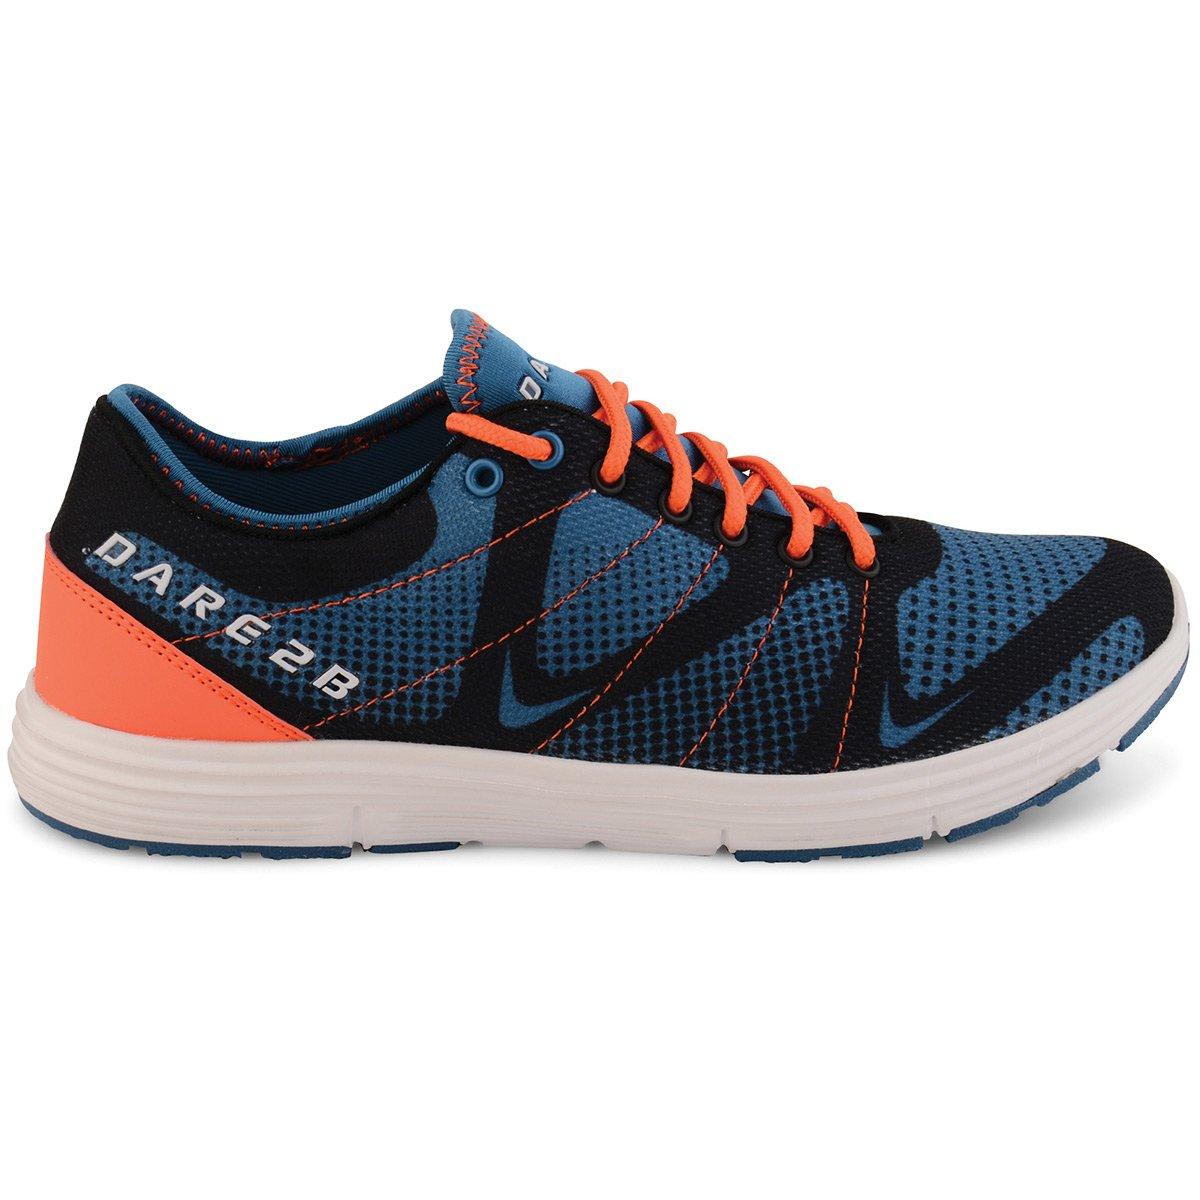 Dare 2b Zapatillas de Poliéster Para Hombre 44 EU|Kingfisher Blue/Pumpkin Orange